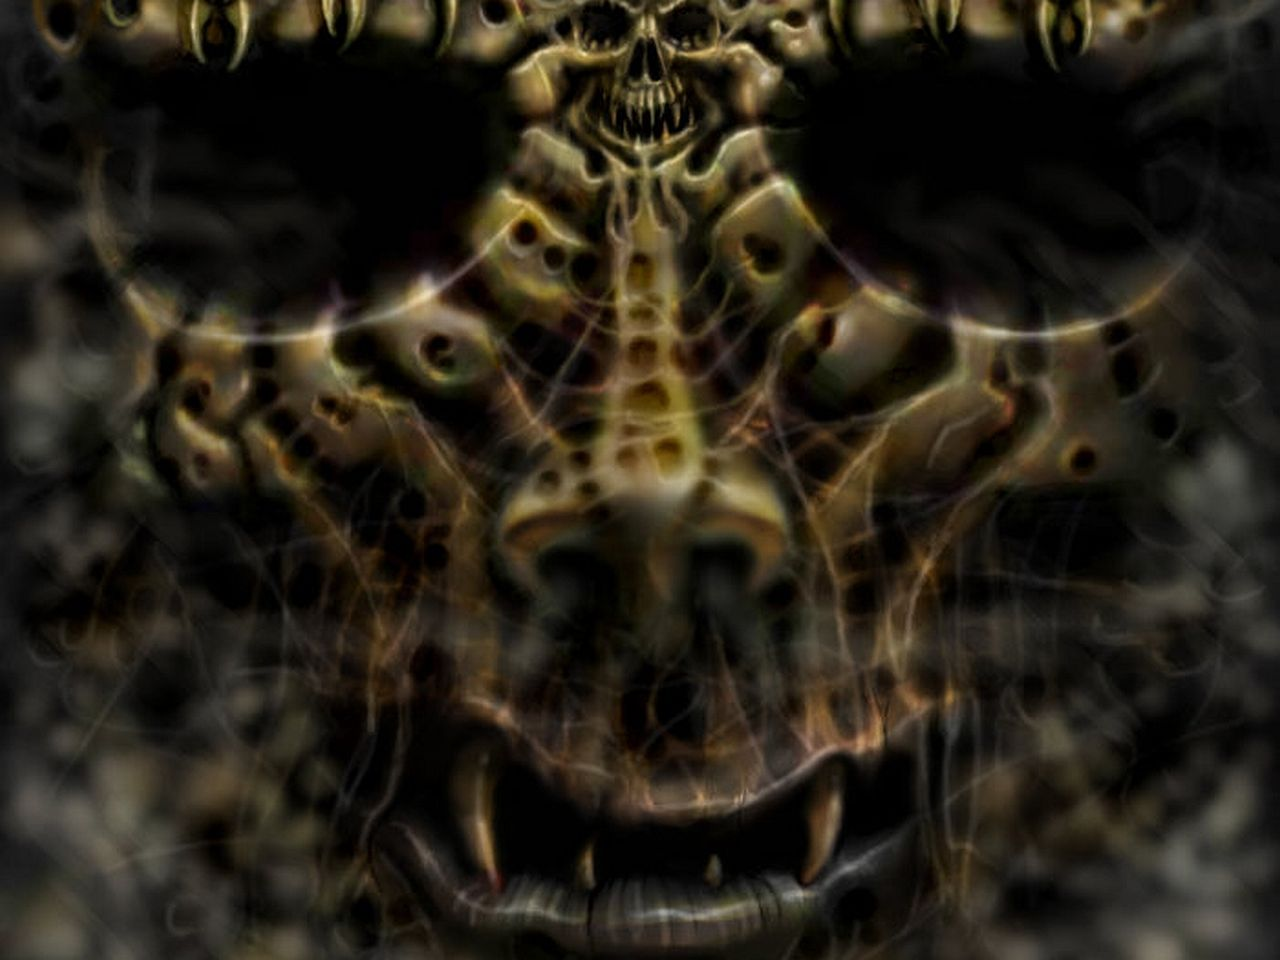 evil demon skulls wallpaper - photo #9